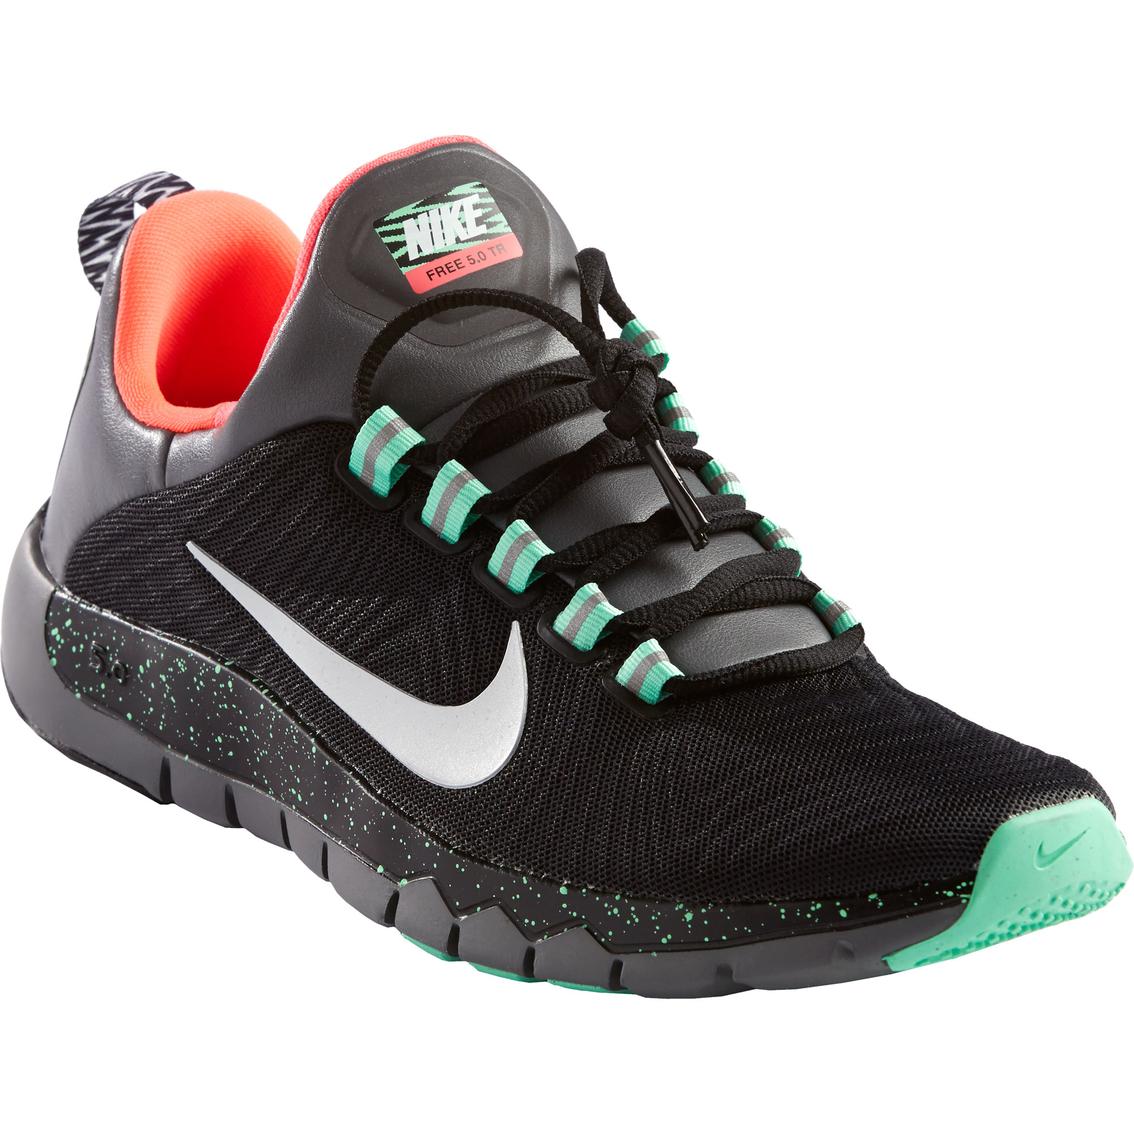 nike men 39 s free trainer 5 0 nrg training shoes cross. Black Bedroom Furniture Sets. Home Design Ideas